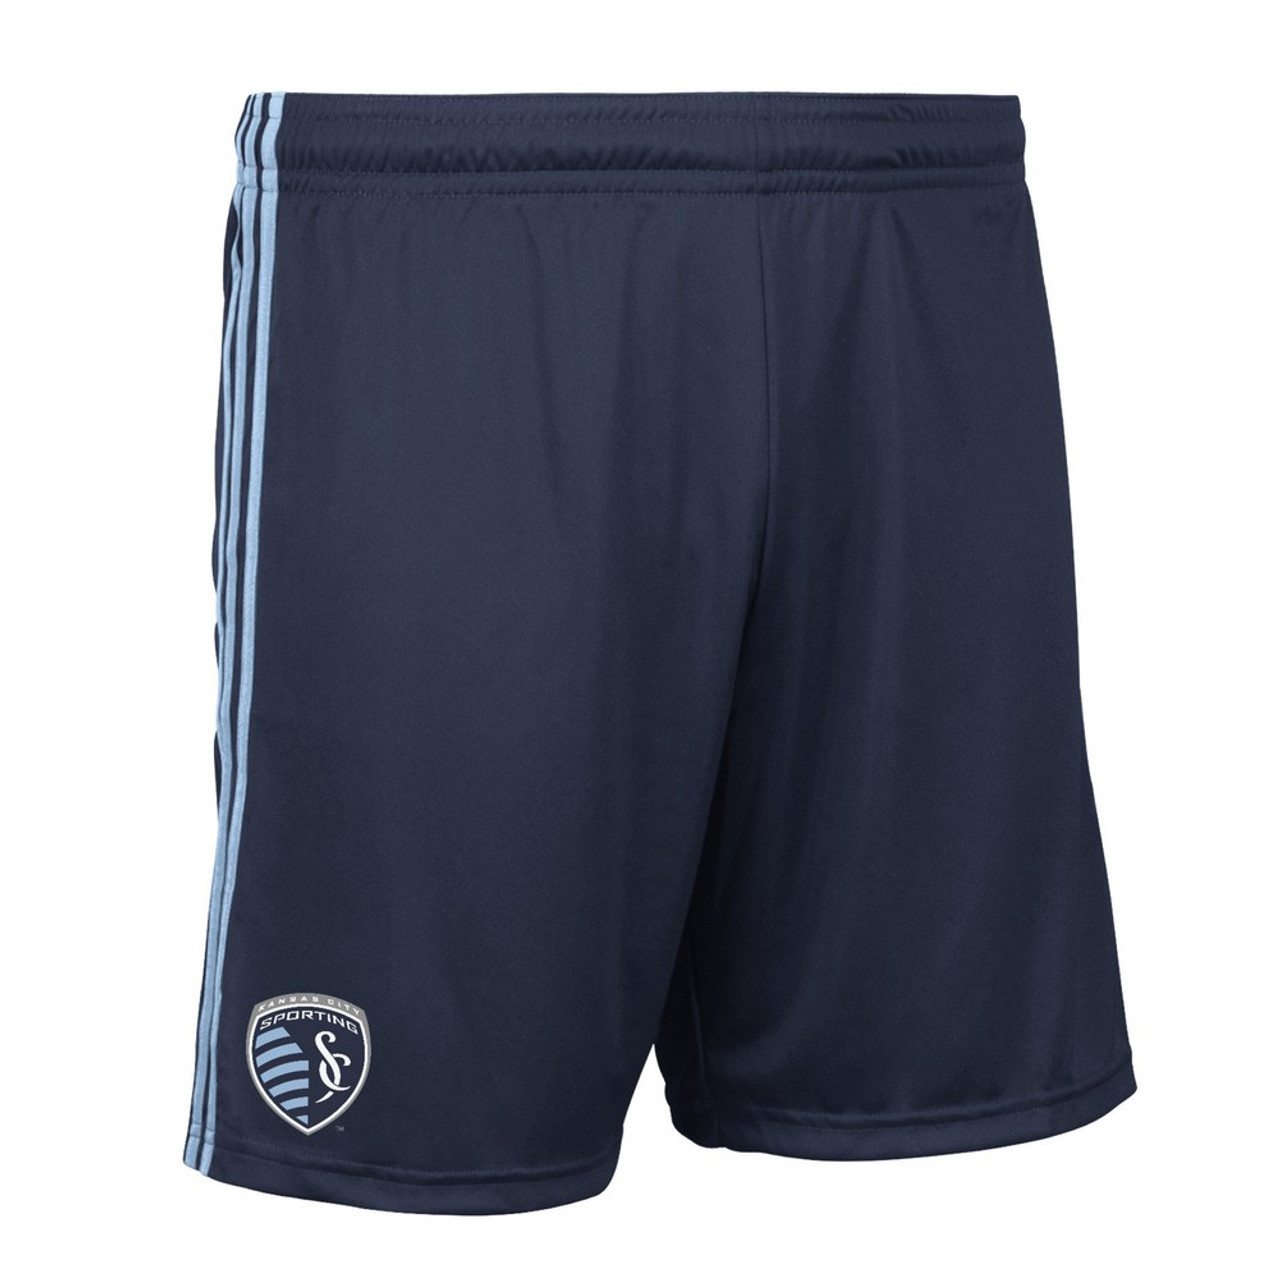 Sporting Kansas City Shorts Replica Adidas Soccer Shorts